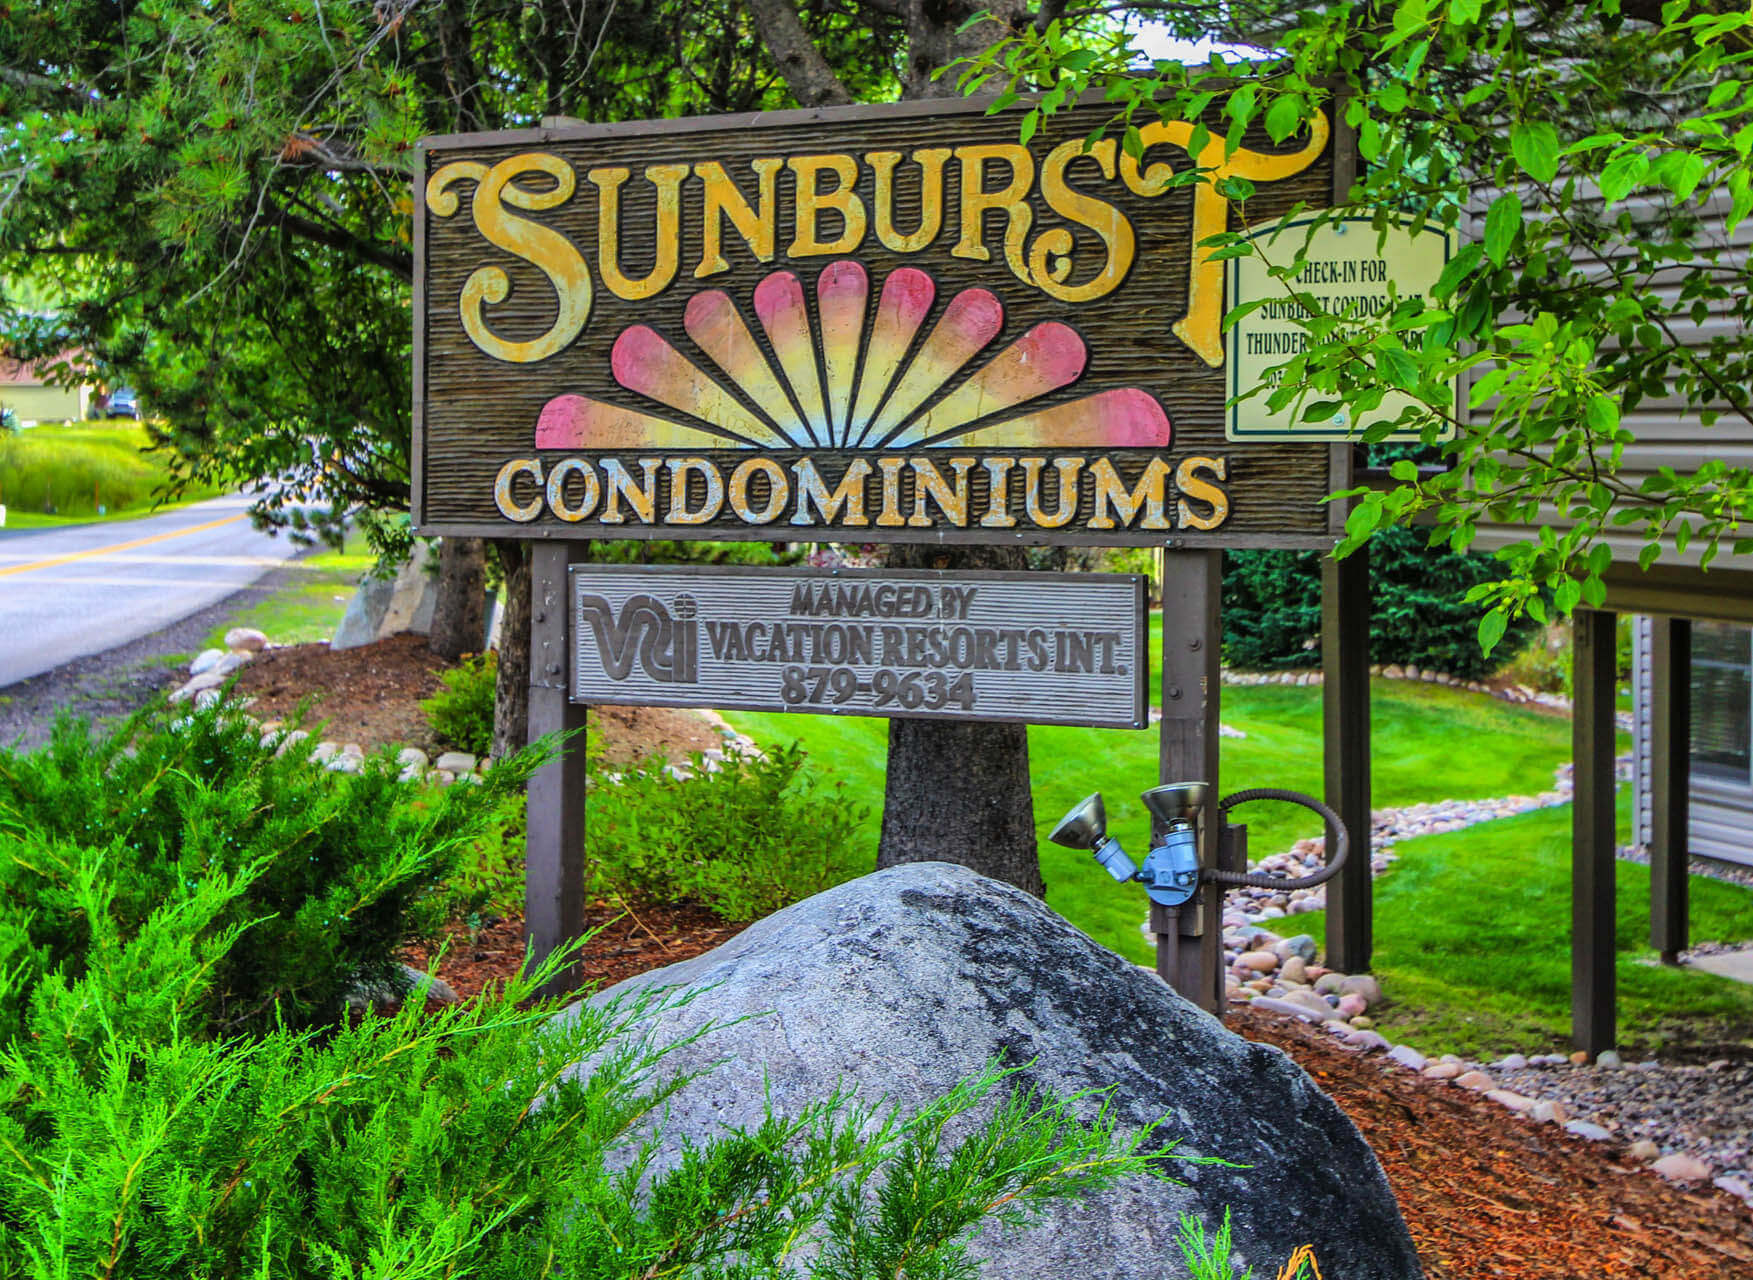 Sunburst Resort Signage